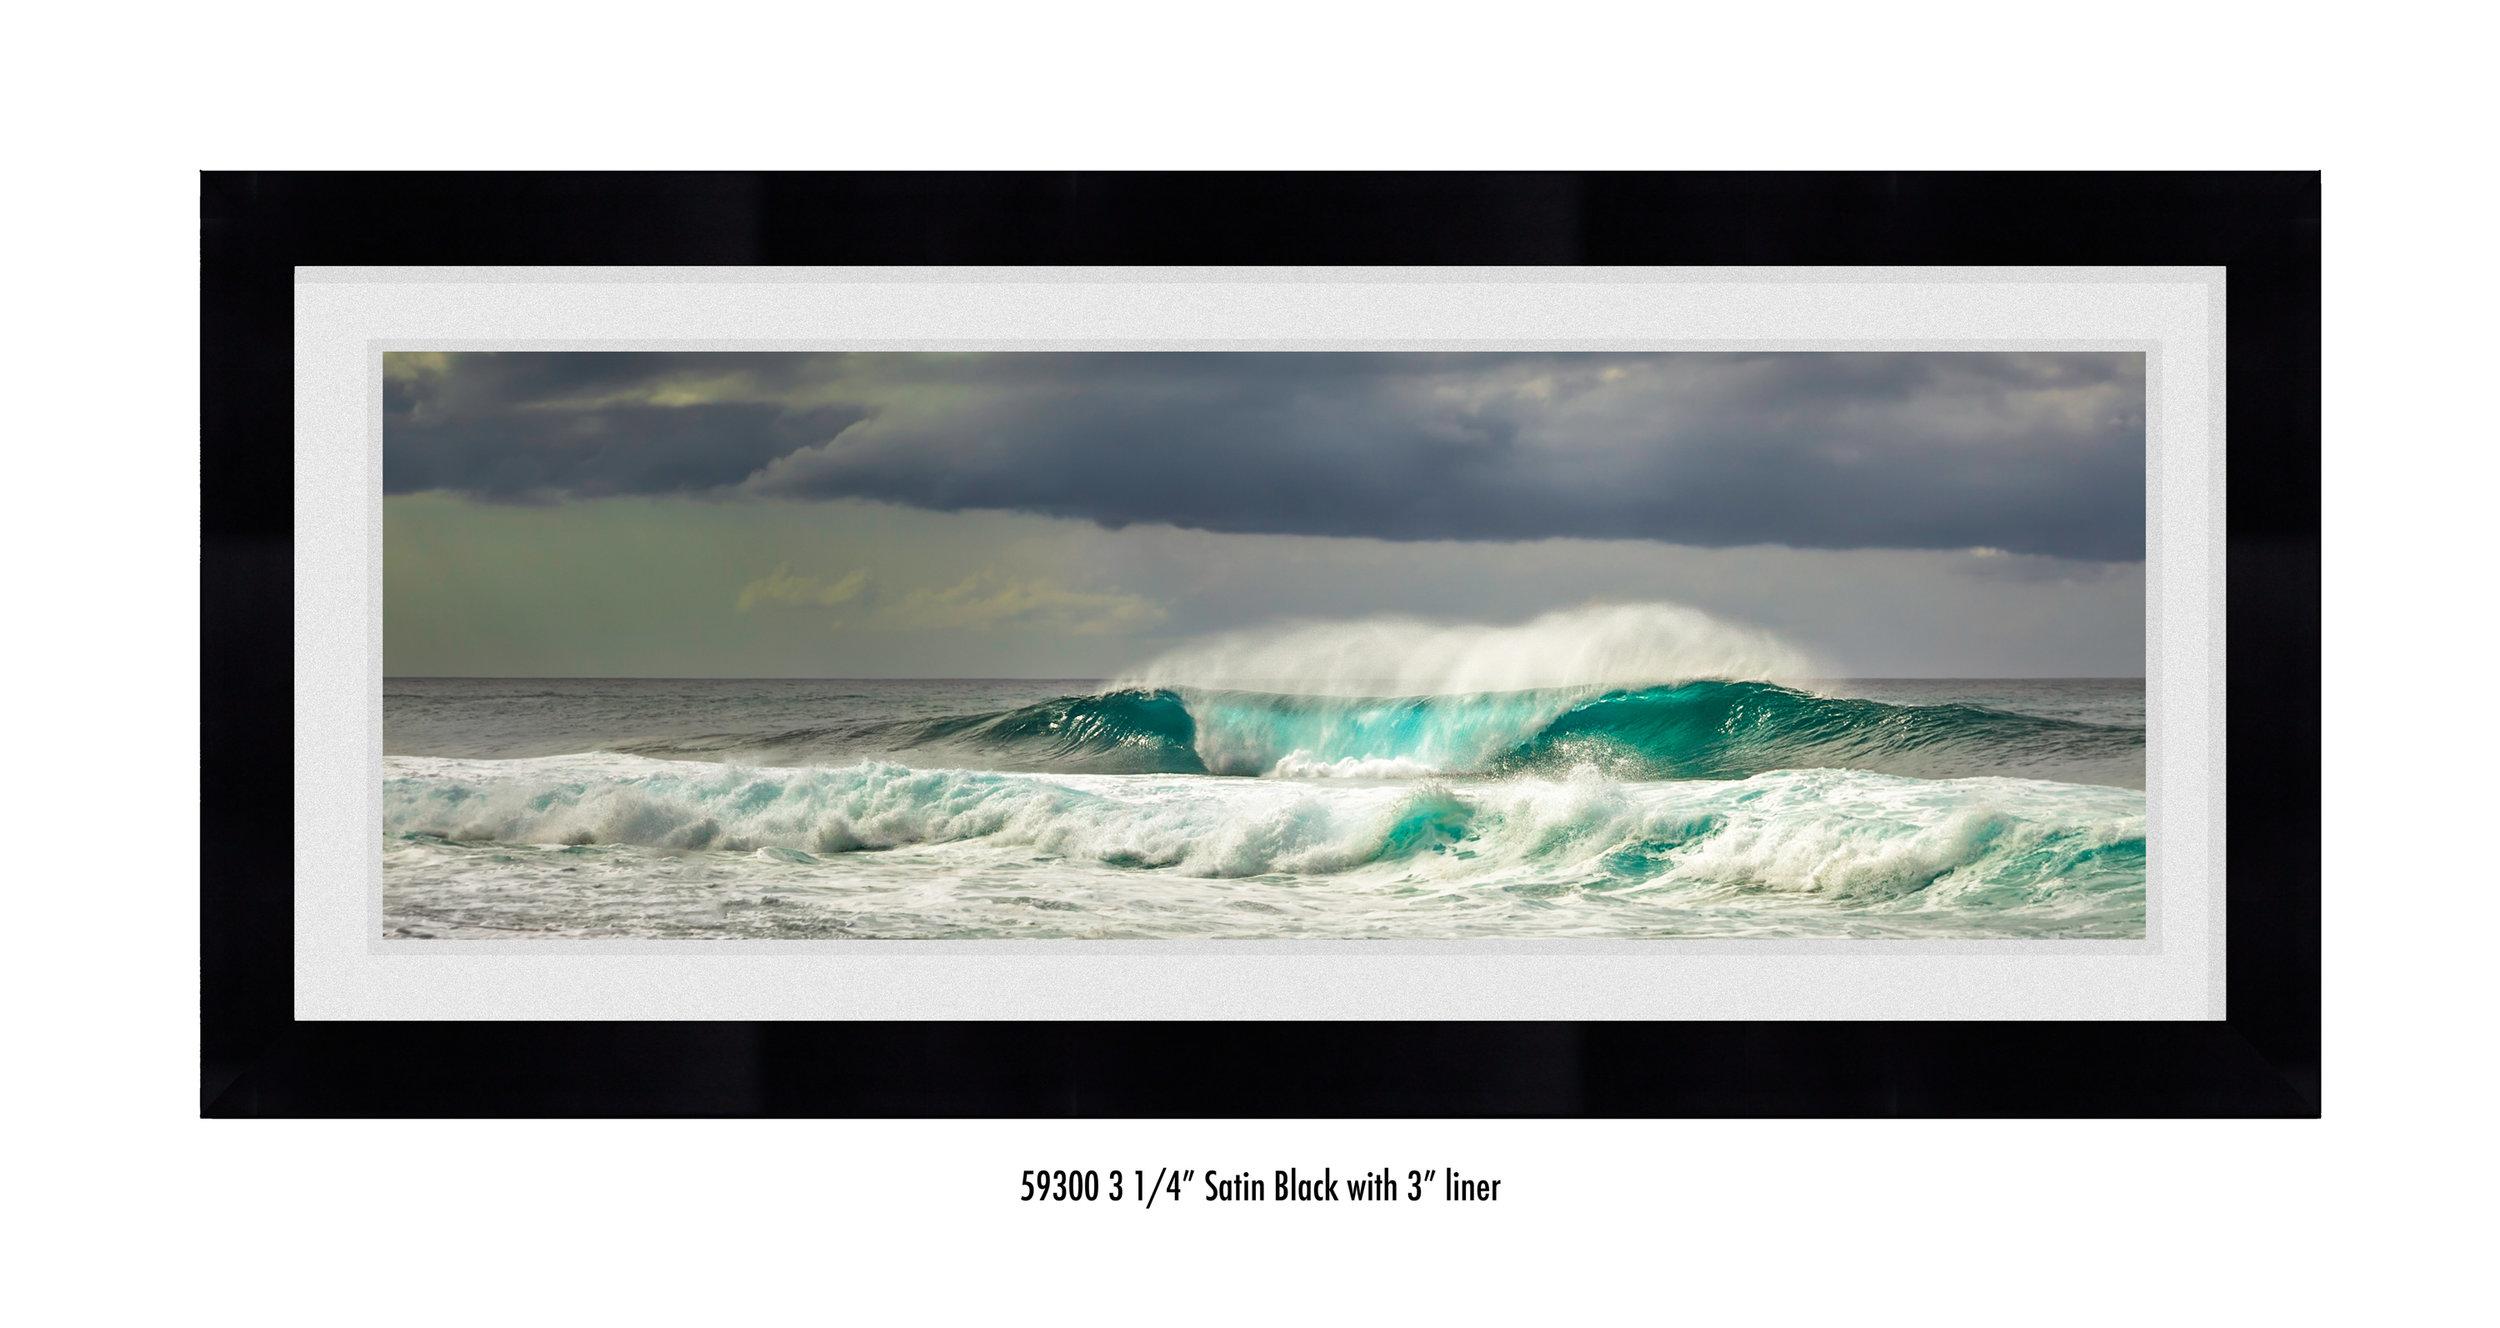 First-Reef-59300-wht.jpg